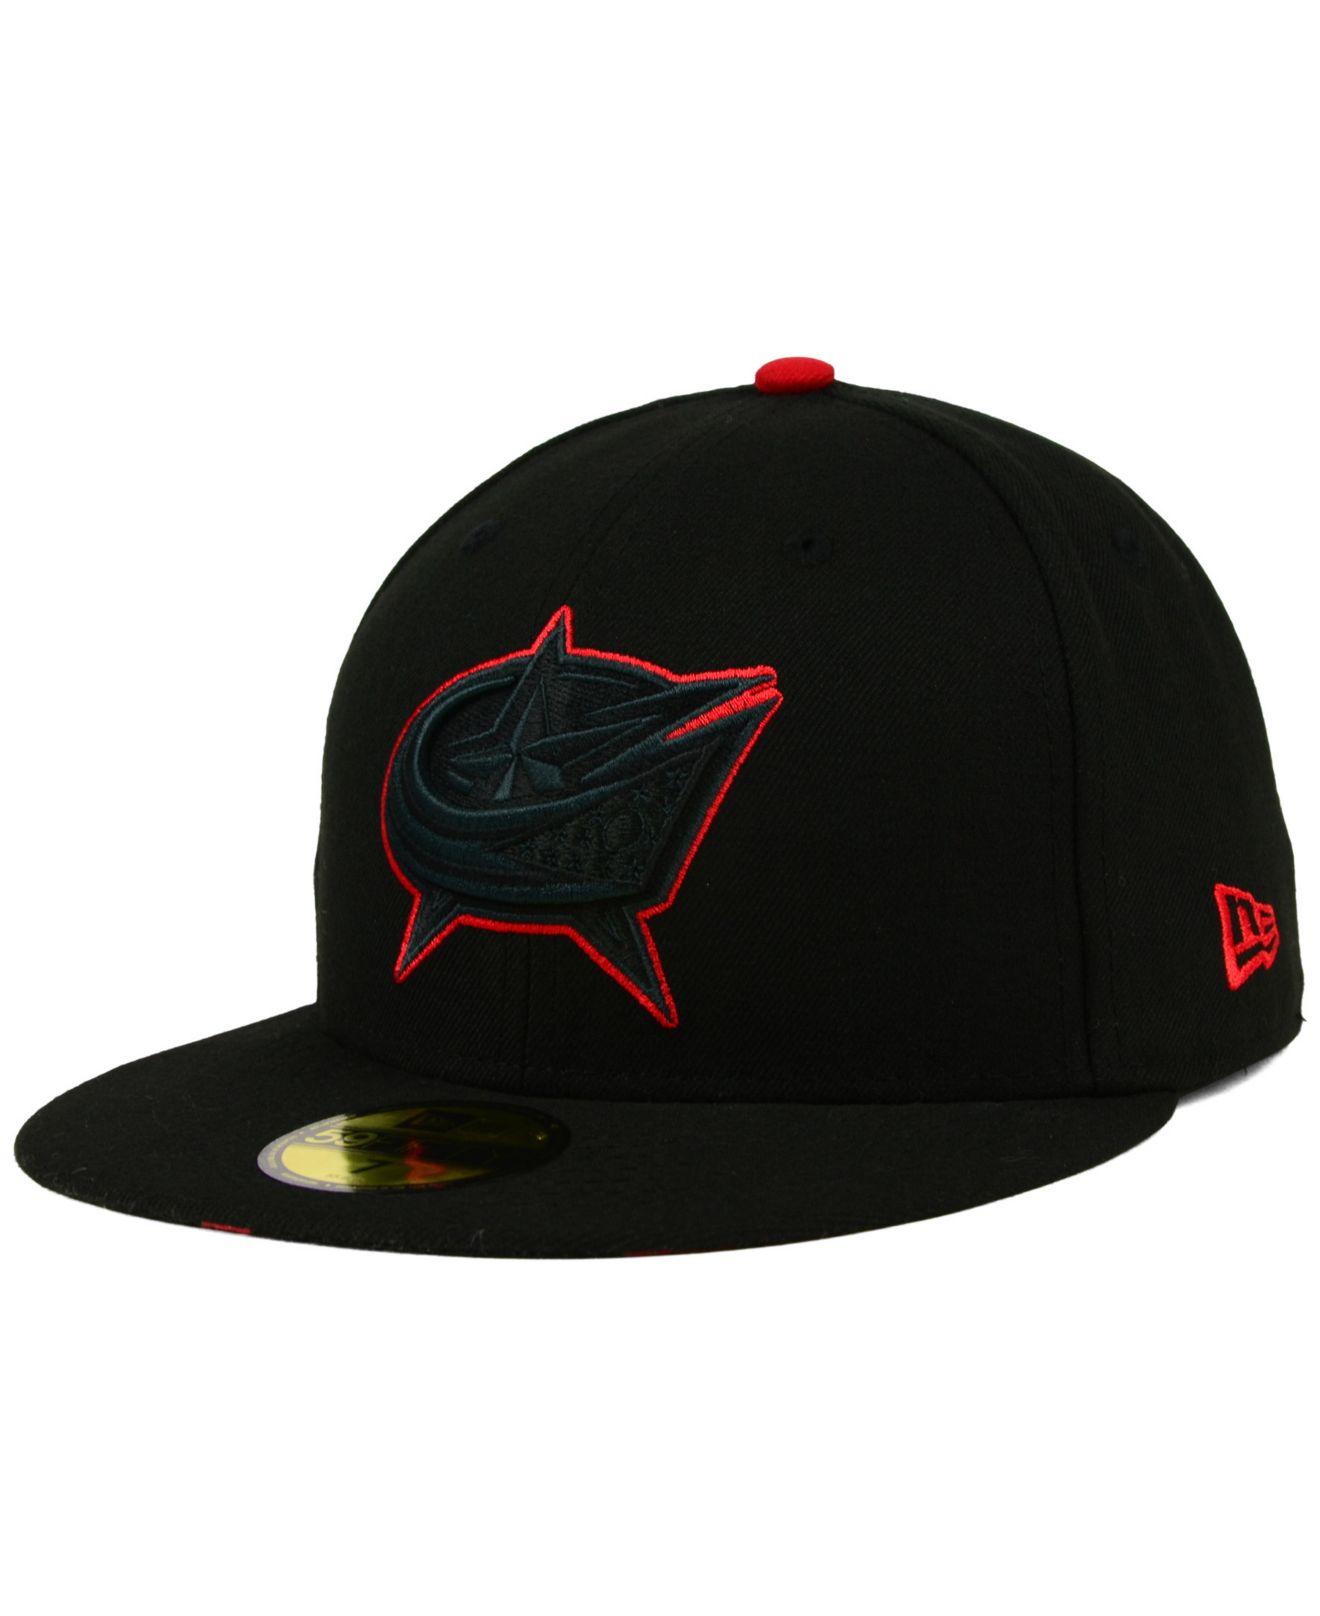 Lyst - KTZ Columbus Blue Jackets Pop Flip 59fifty Cap in Black for Men faf7da40d1c